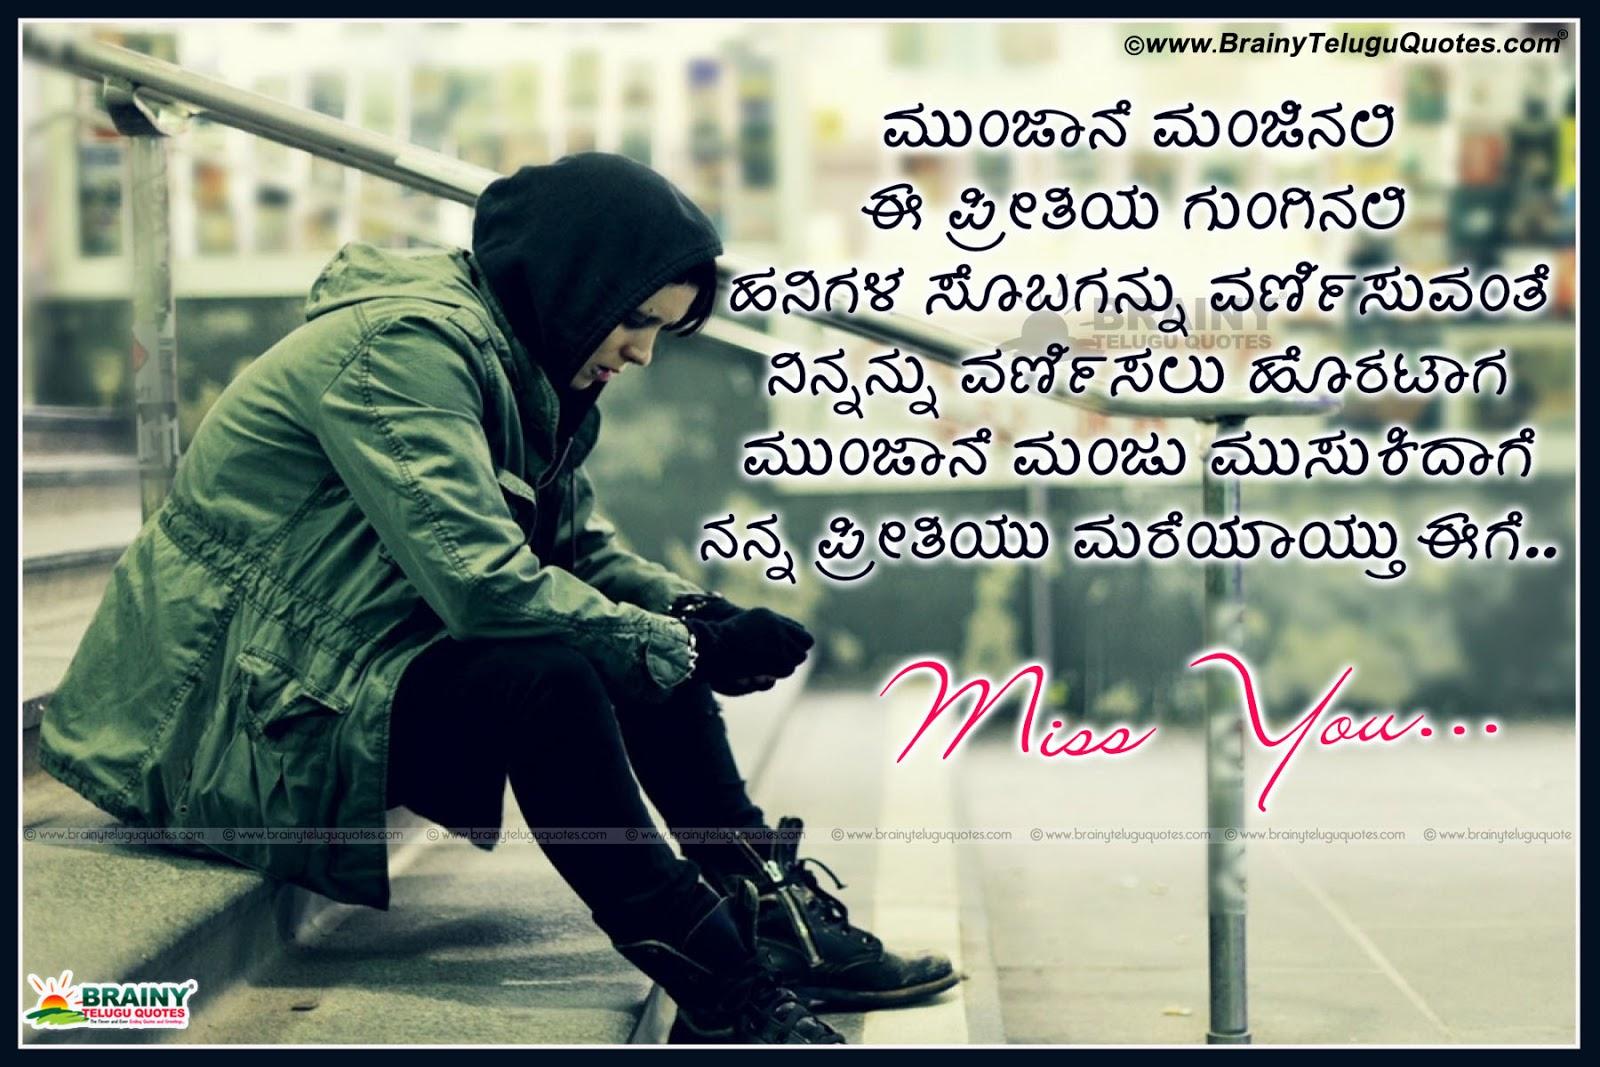 Sad Quotes In Kannada Kannada new miss you quotations love preethi kavanagalu